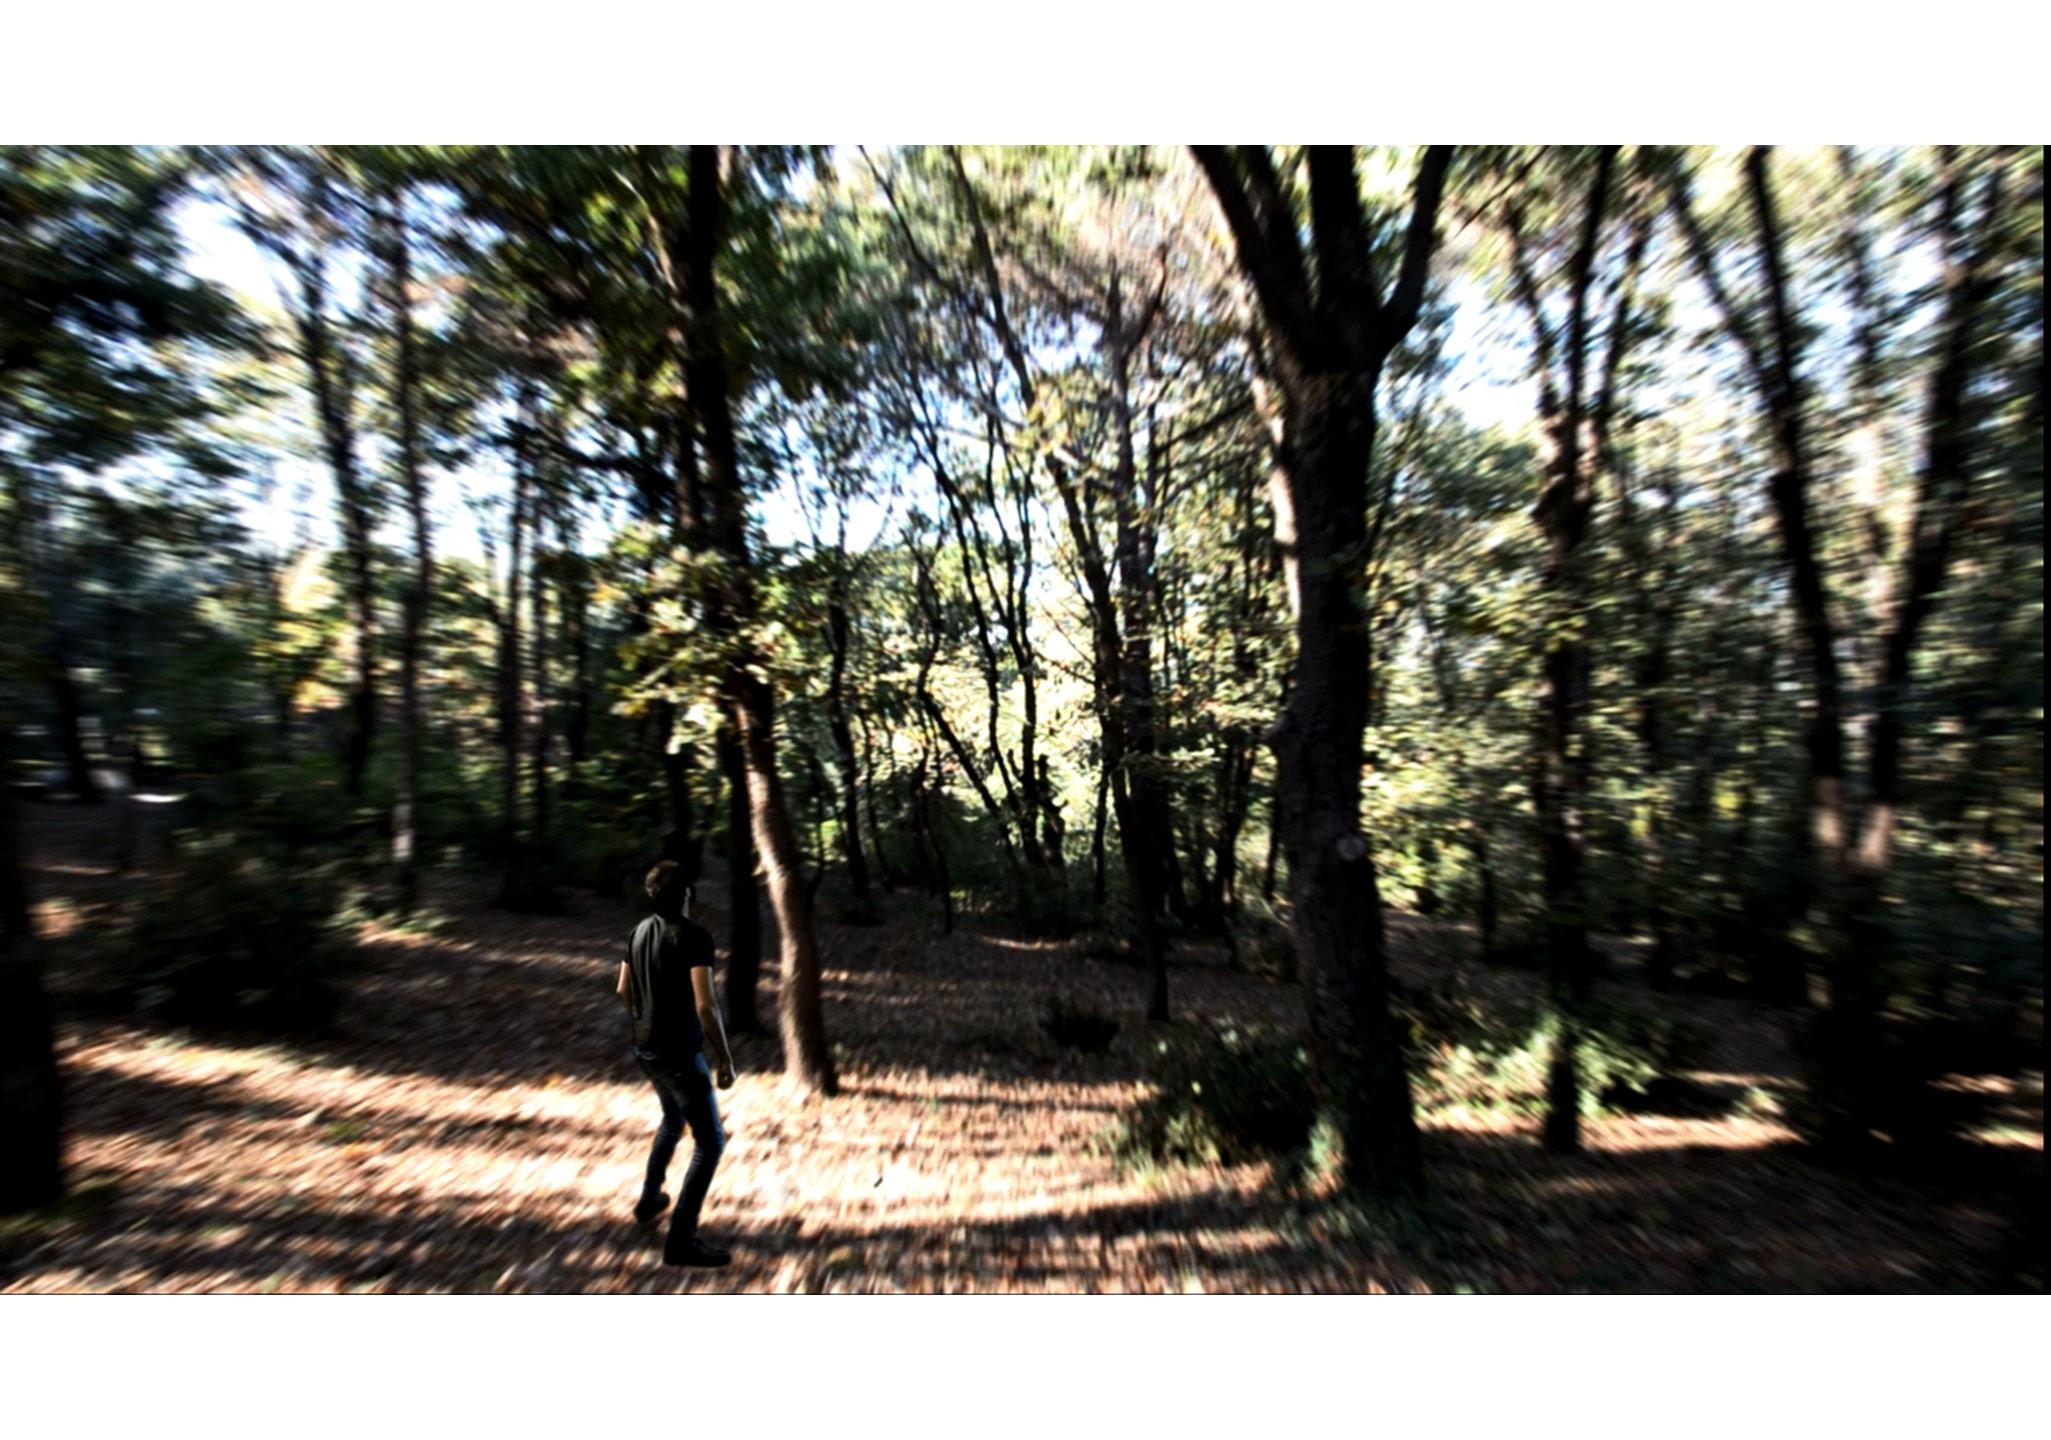 mış gibi hissetmek, video, 2014